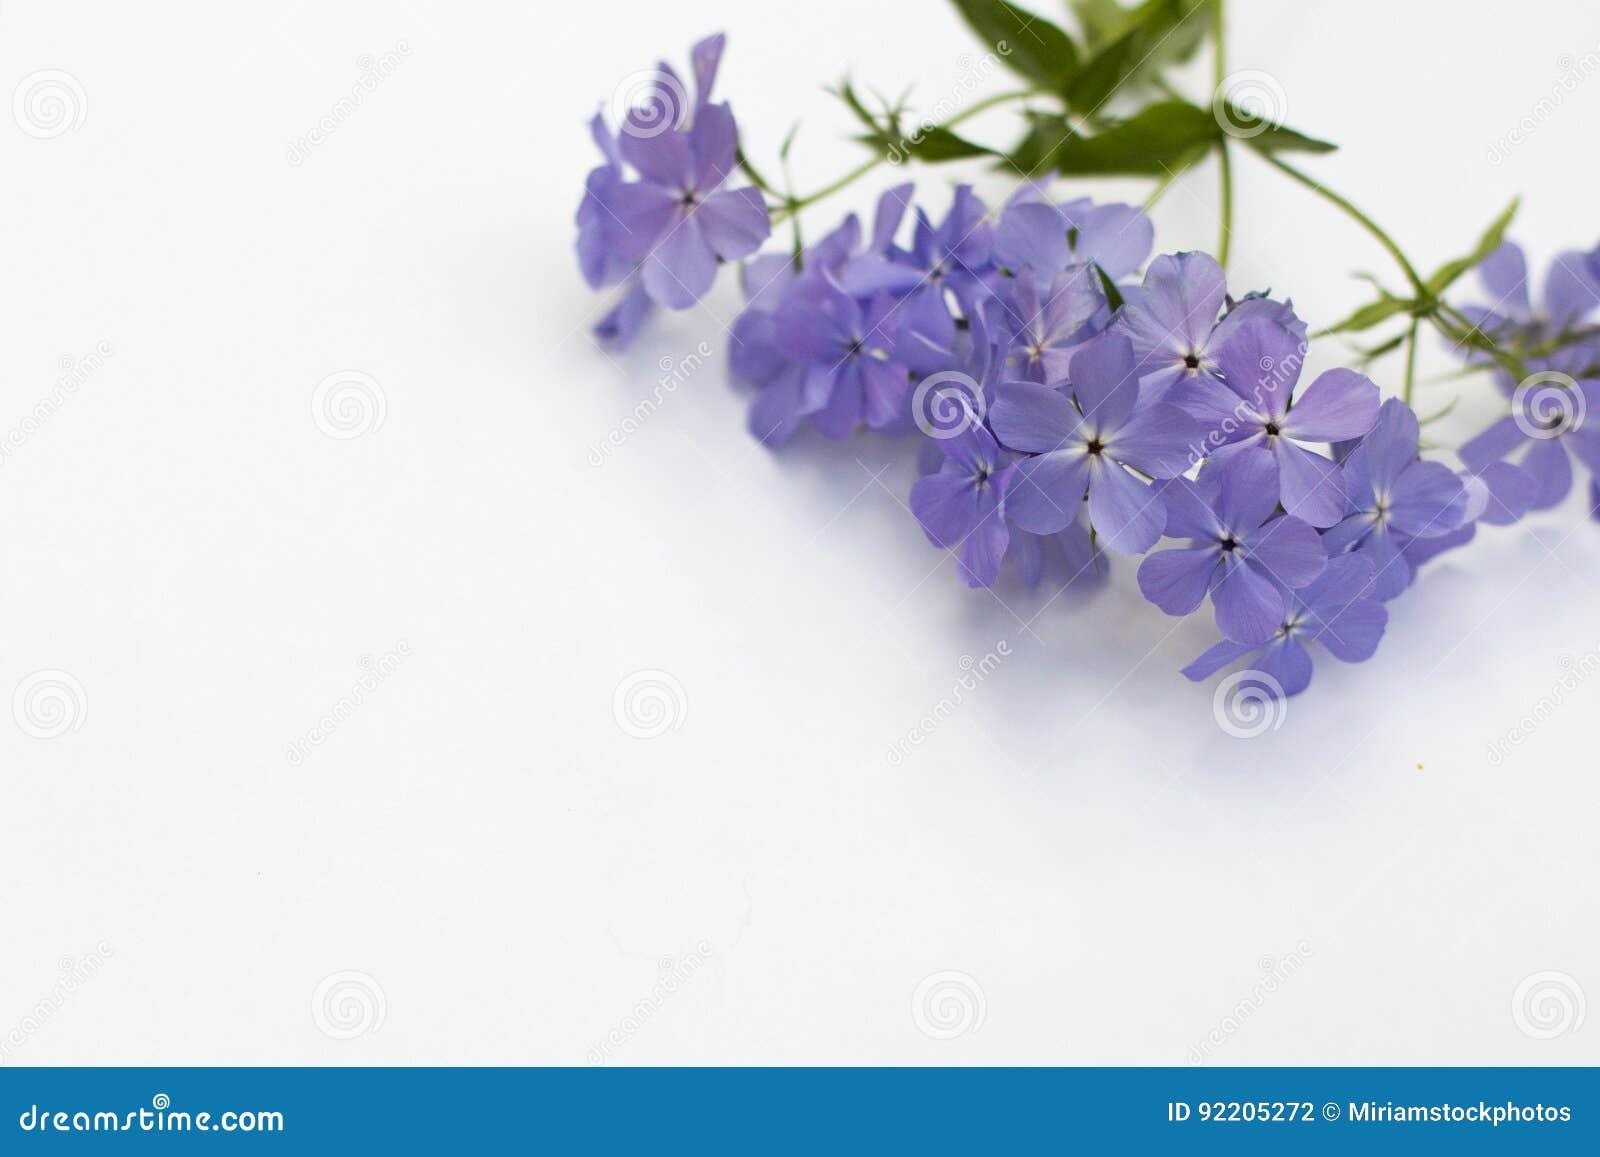 Phlox Blue Moon Flowers On White Background Stock Photo Image Of